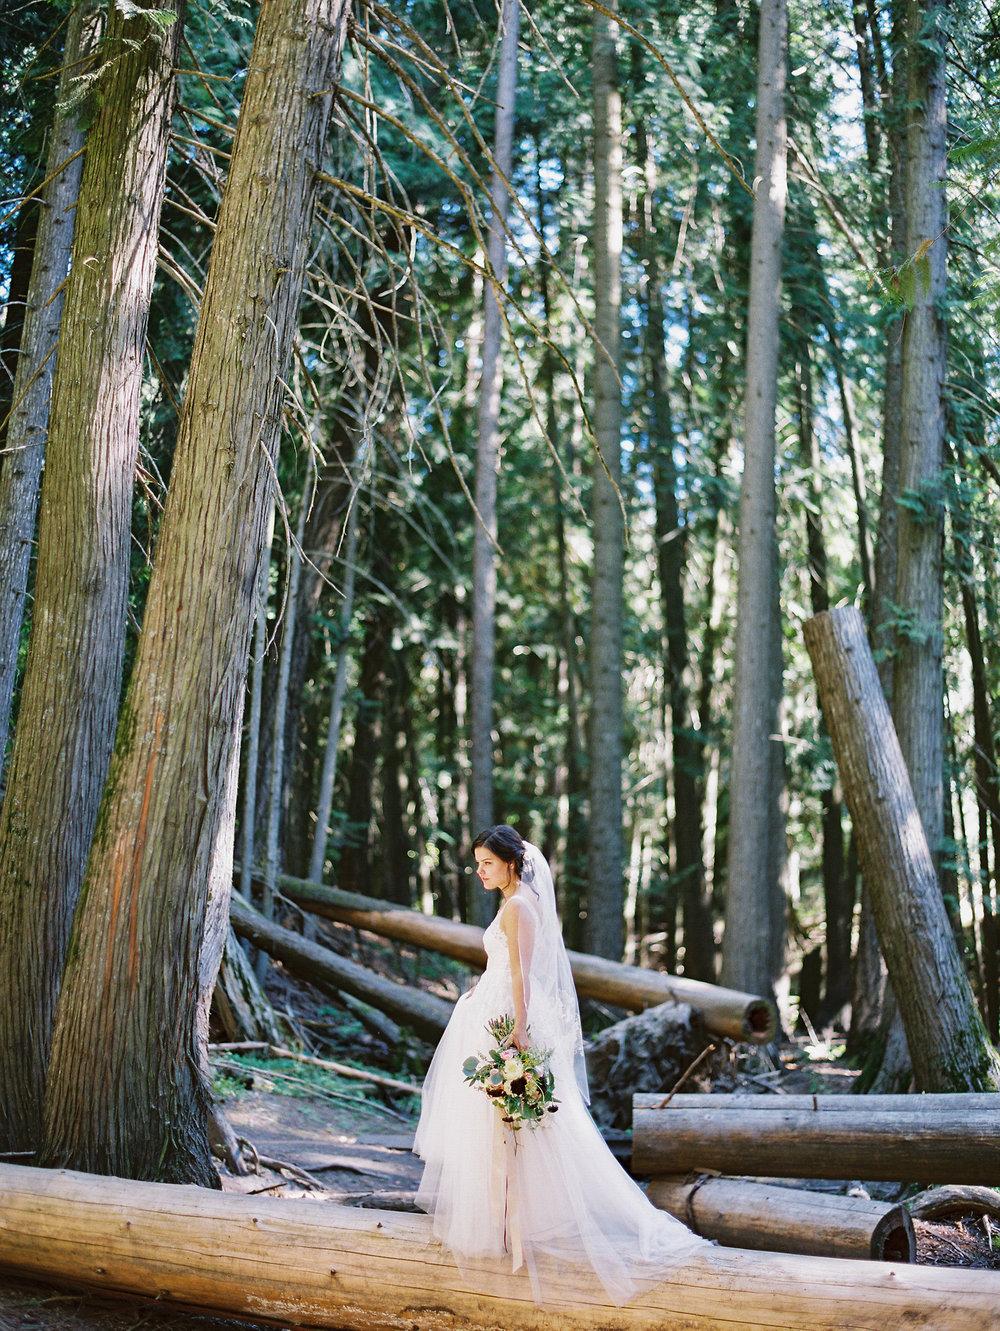 Idaho-Field-Forest-Wedding-Film-Photographer-Kristina-Adams-354.jpg